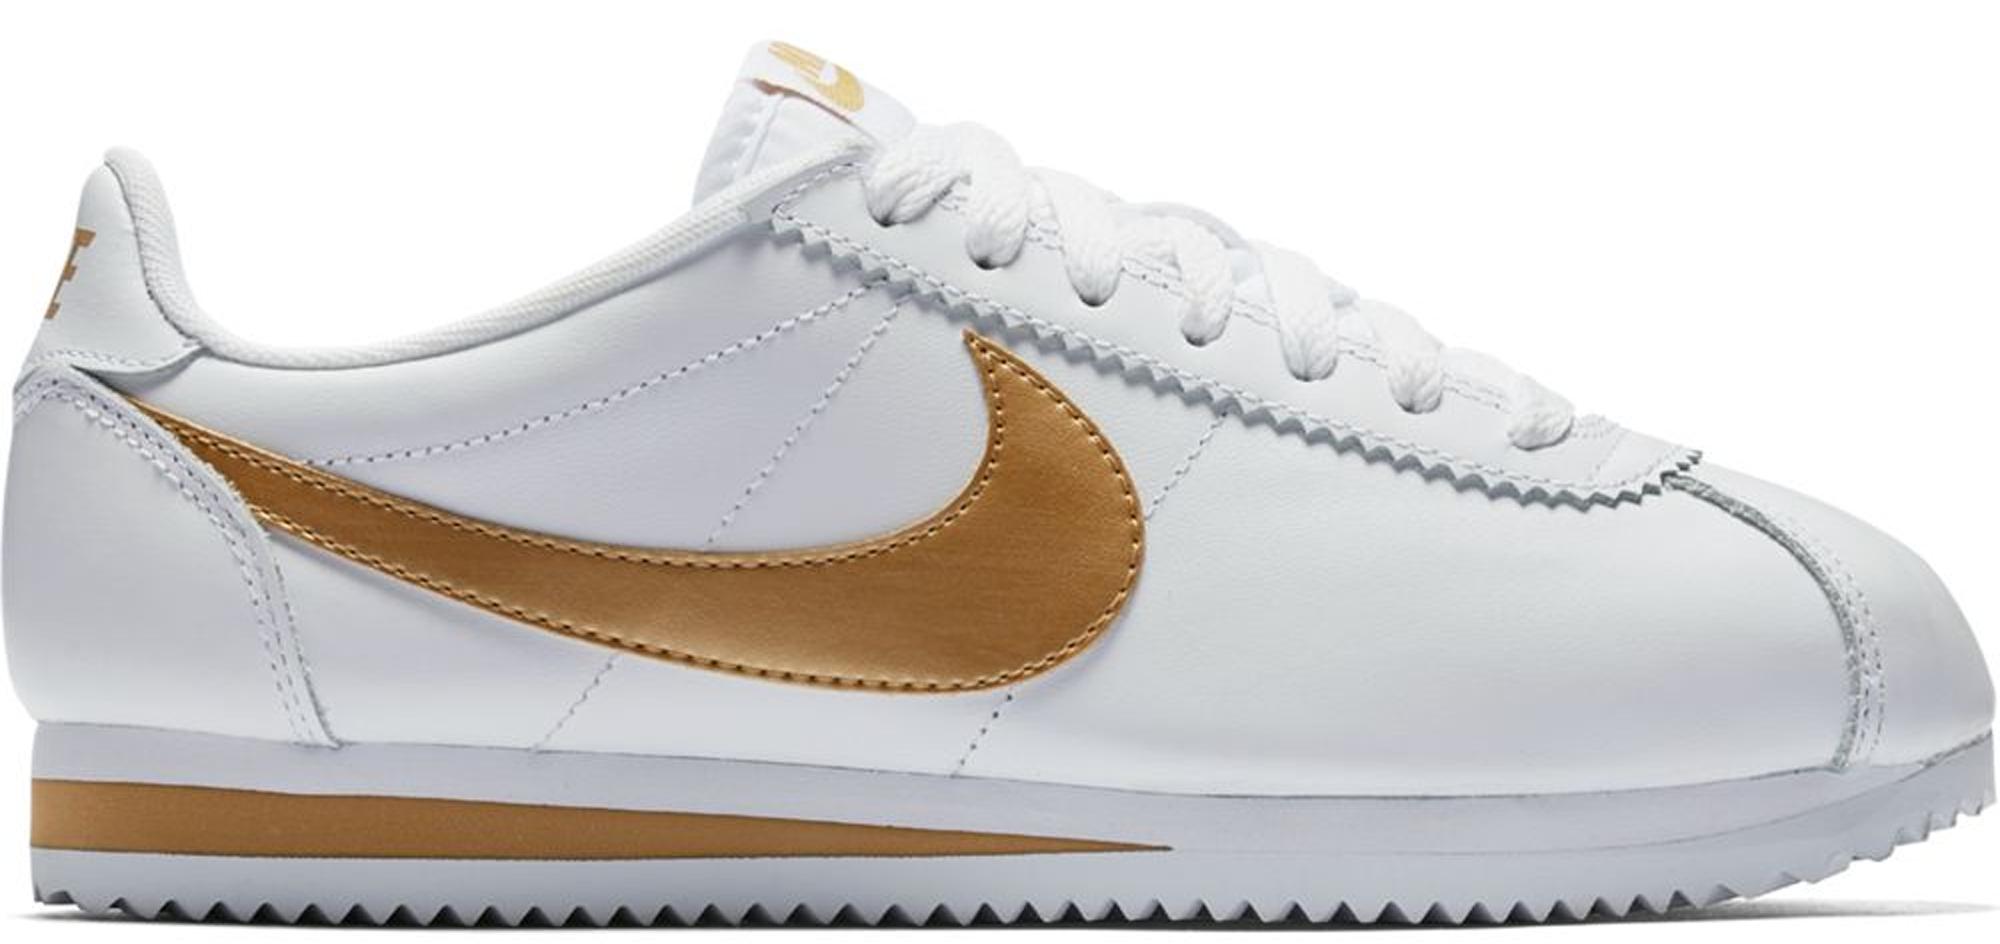 Nike Classic Cortez White Metallic Gold